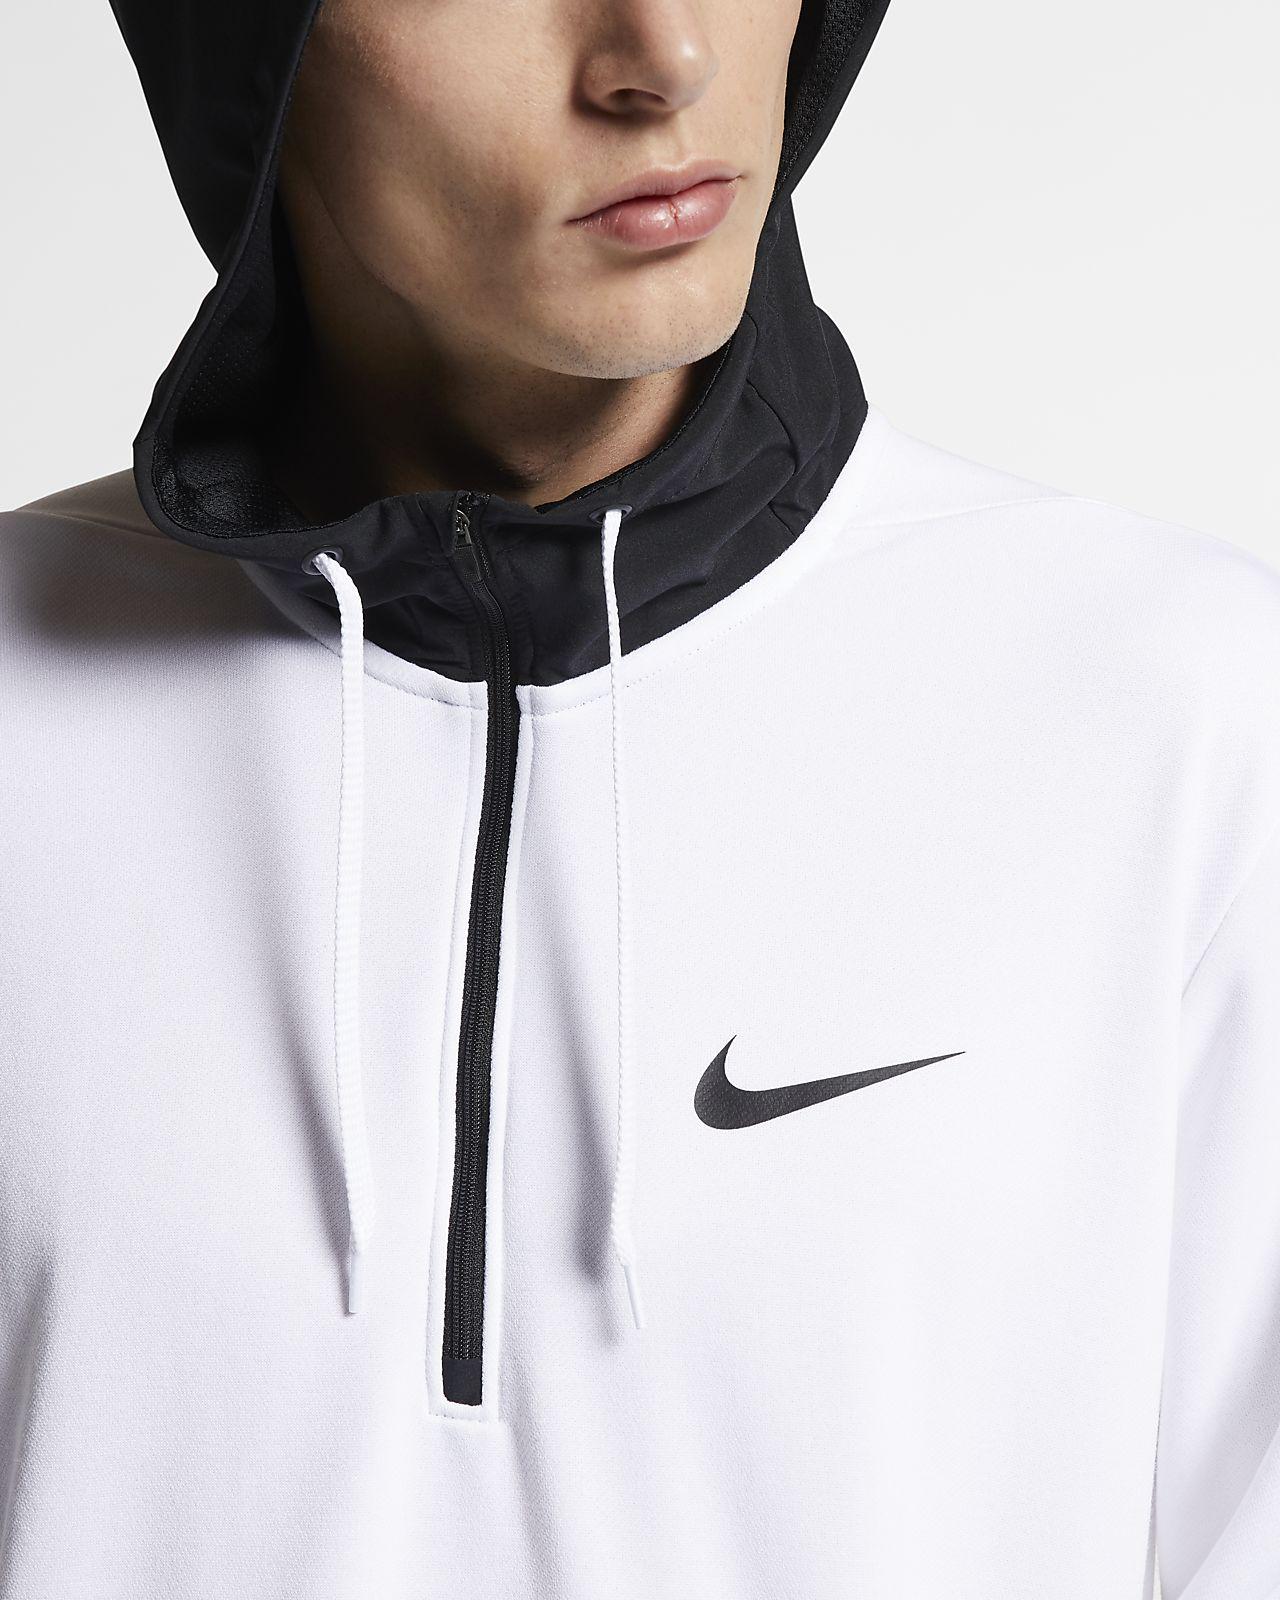 c0bf41b0c0 Nike Dri-FIT Men's Fleece Training Hoodie